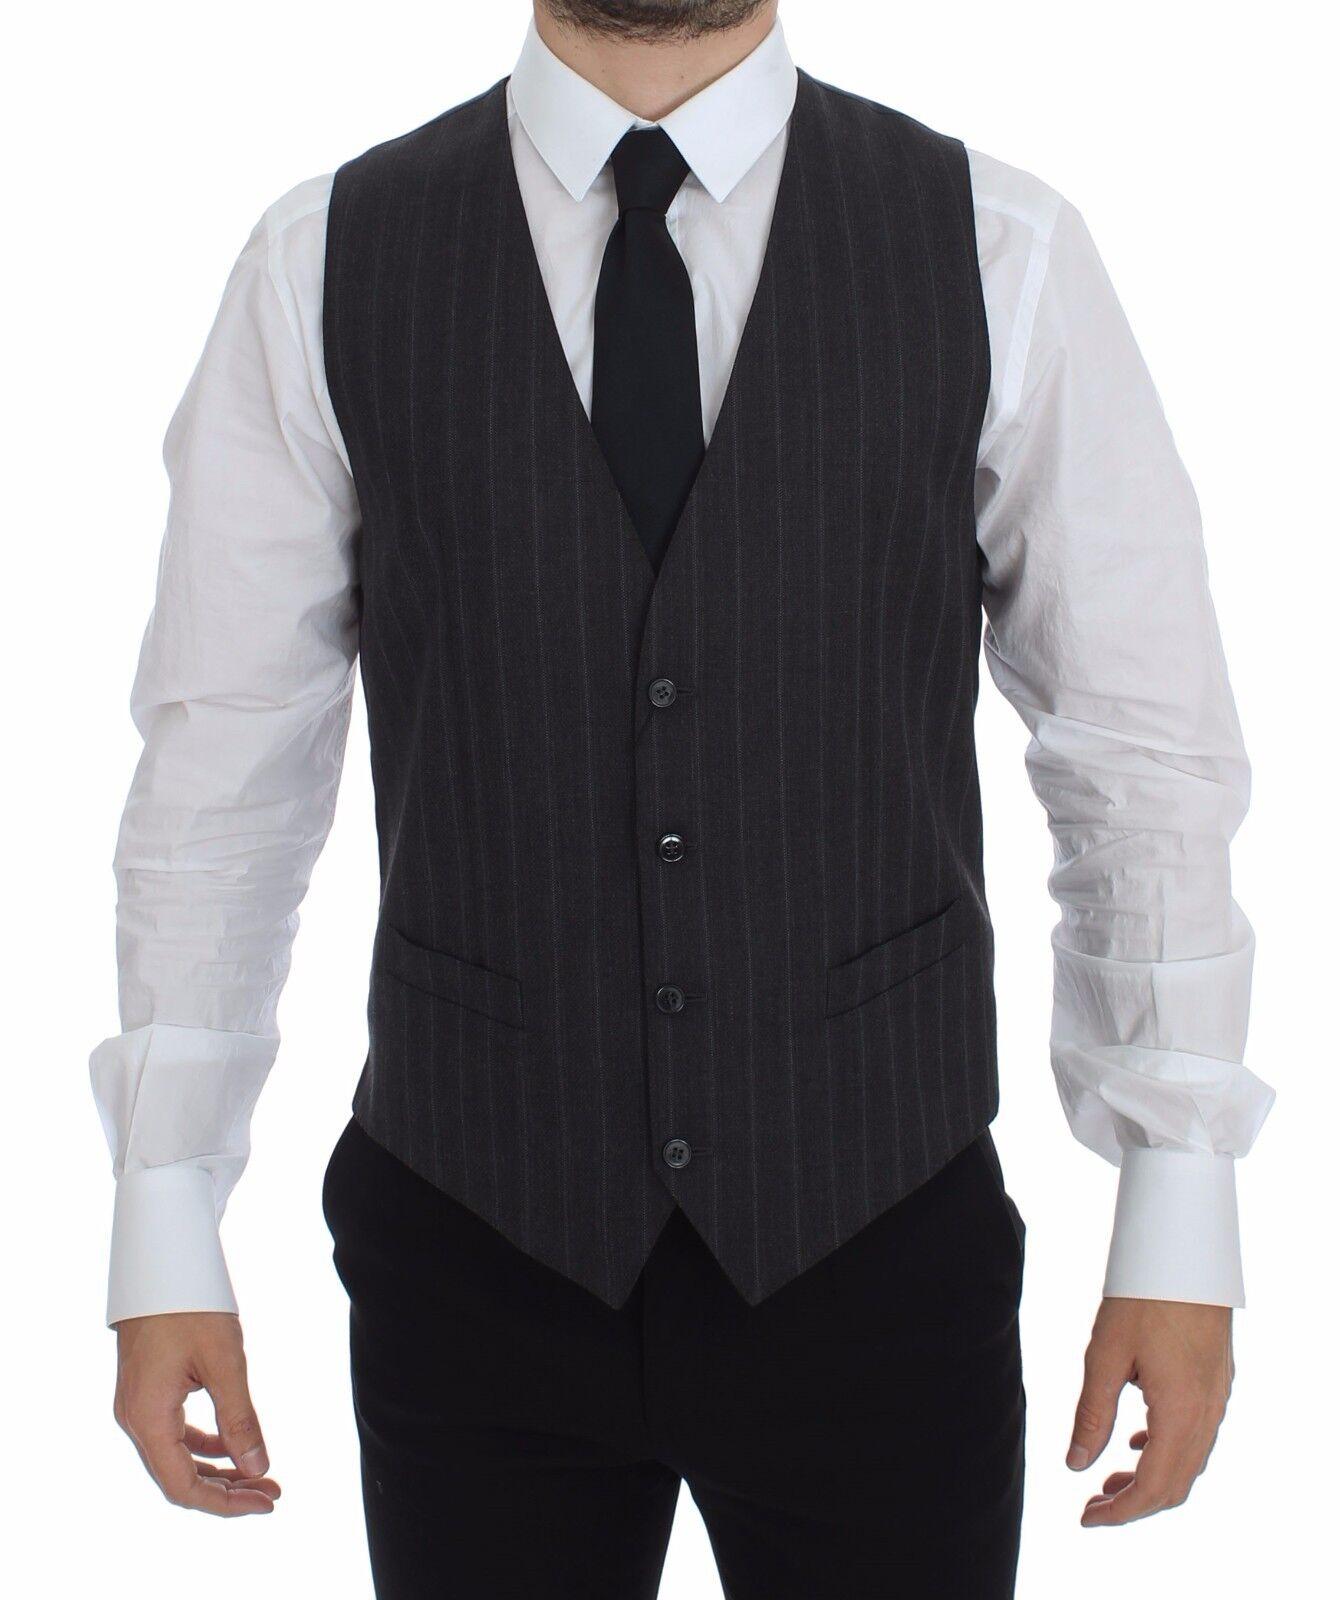 NWT DOLCE & GABBANA grau Striped Wool Logo Vest Gilet Weste IT48 / US38/ M